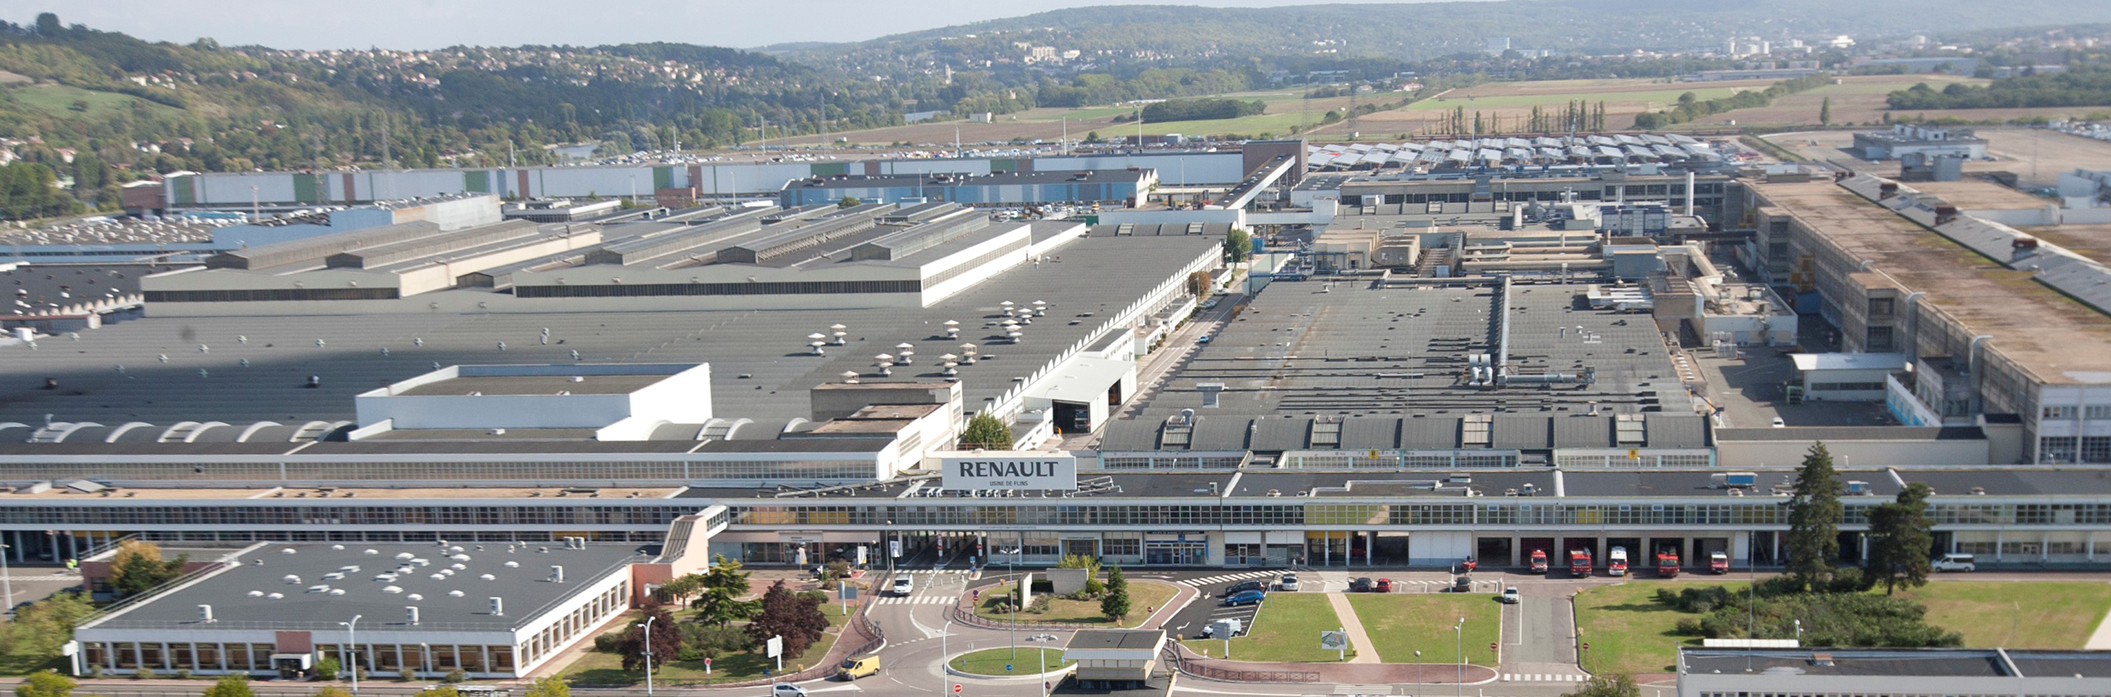 usine flins renault